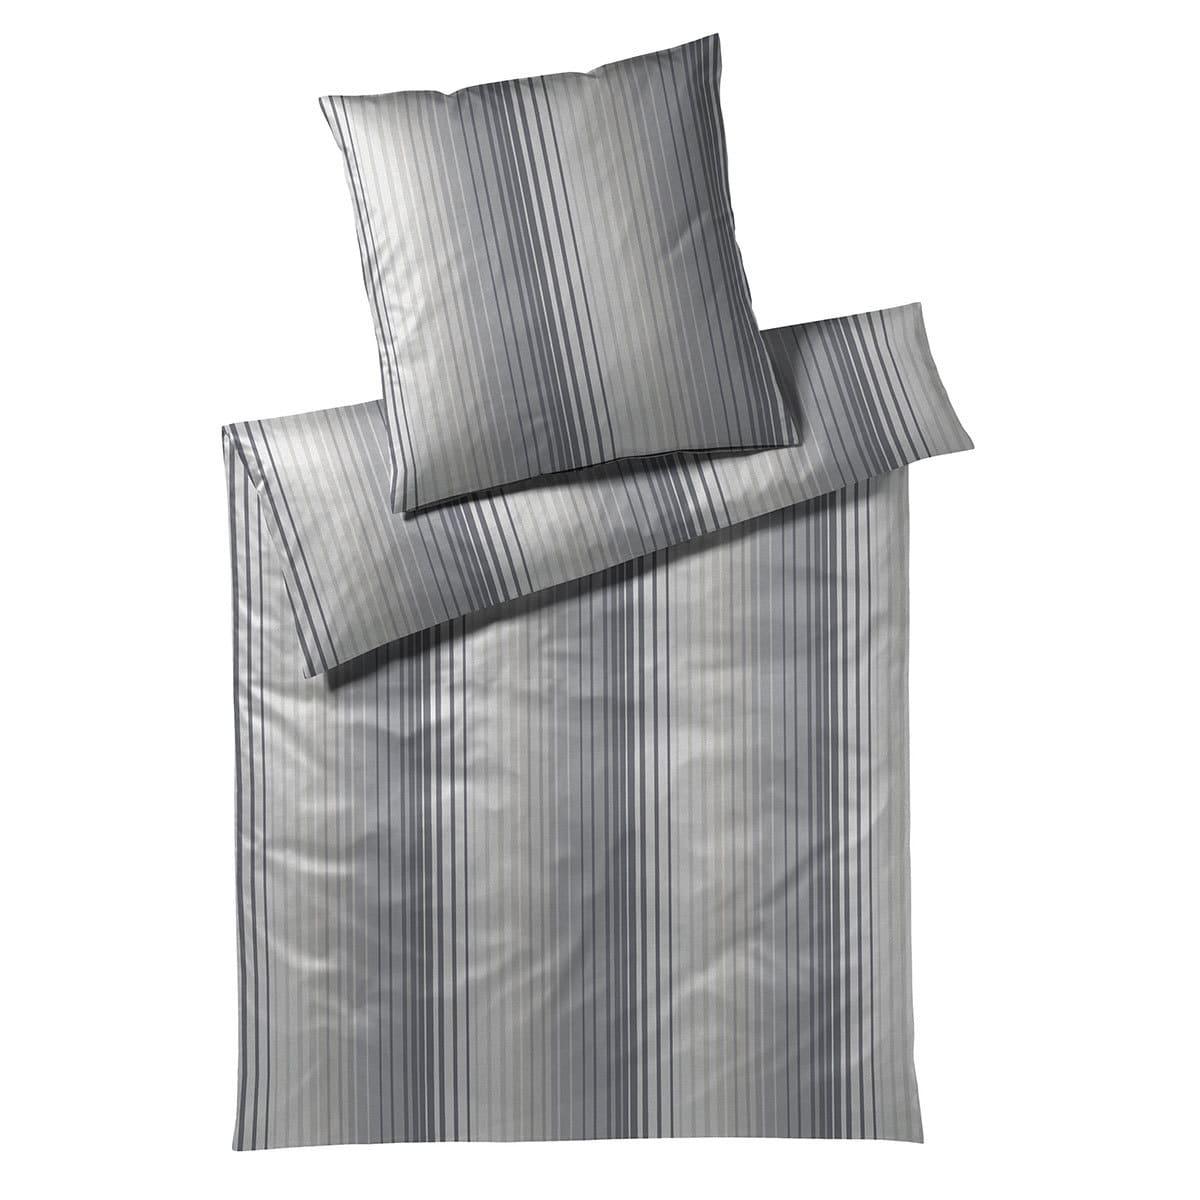 elegante jersey bettw sche blend coal g nstig online kaufen bei bettwaren shop. Black Bedroom Furniture Sets. Home Design Ideas